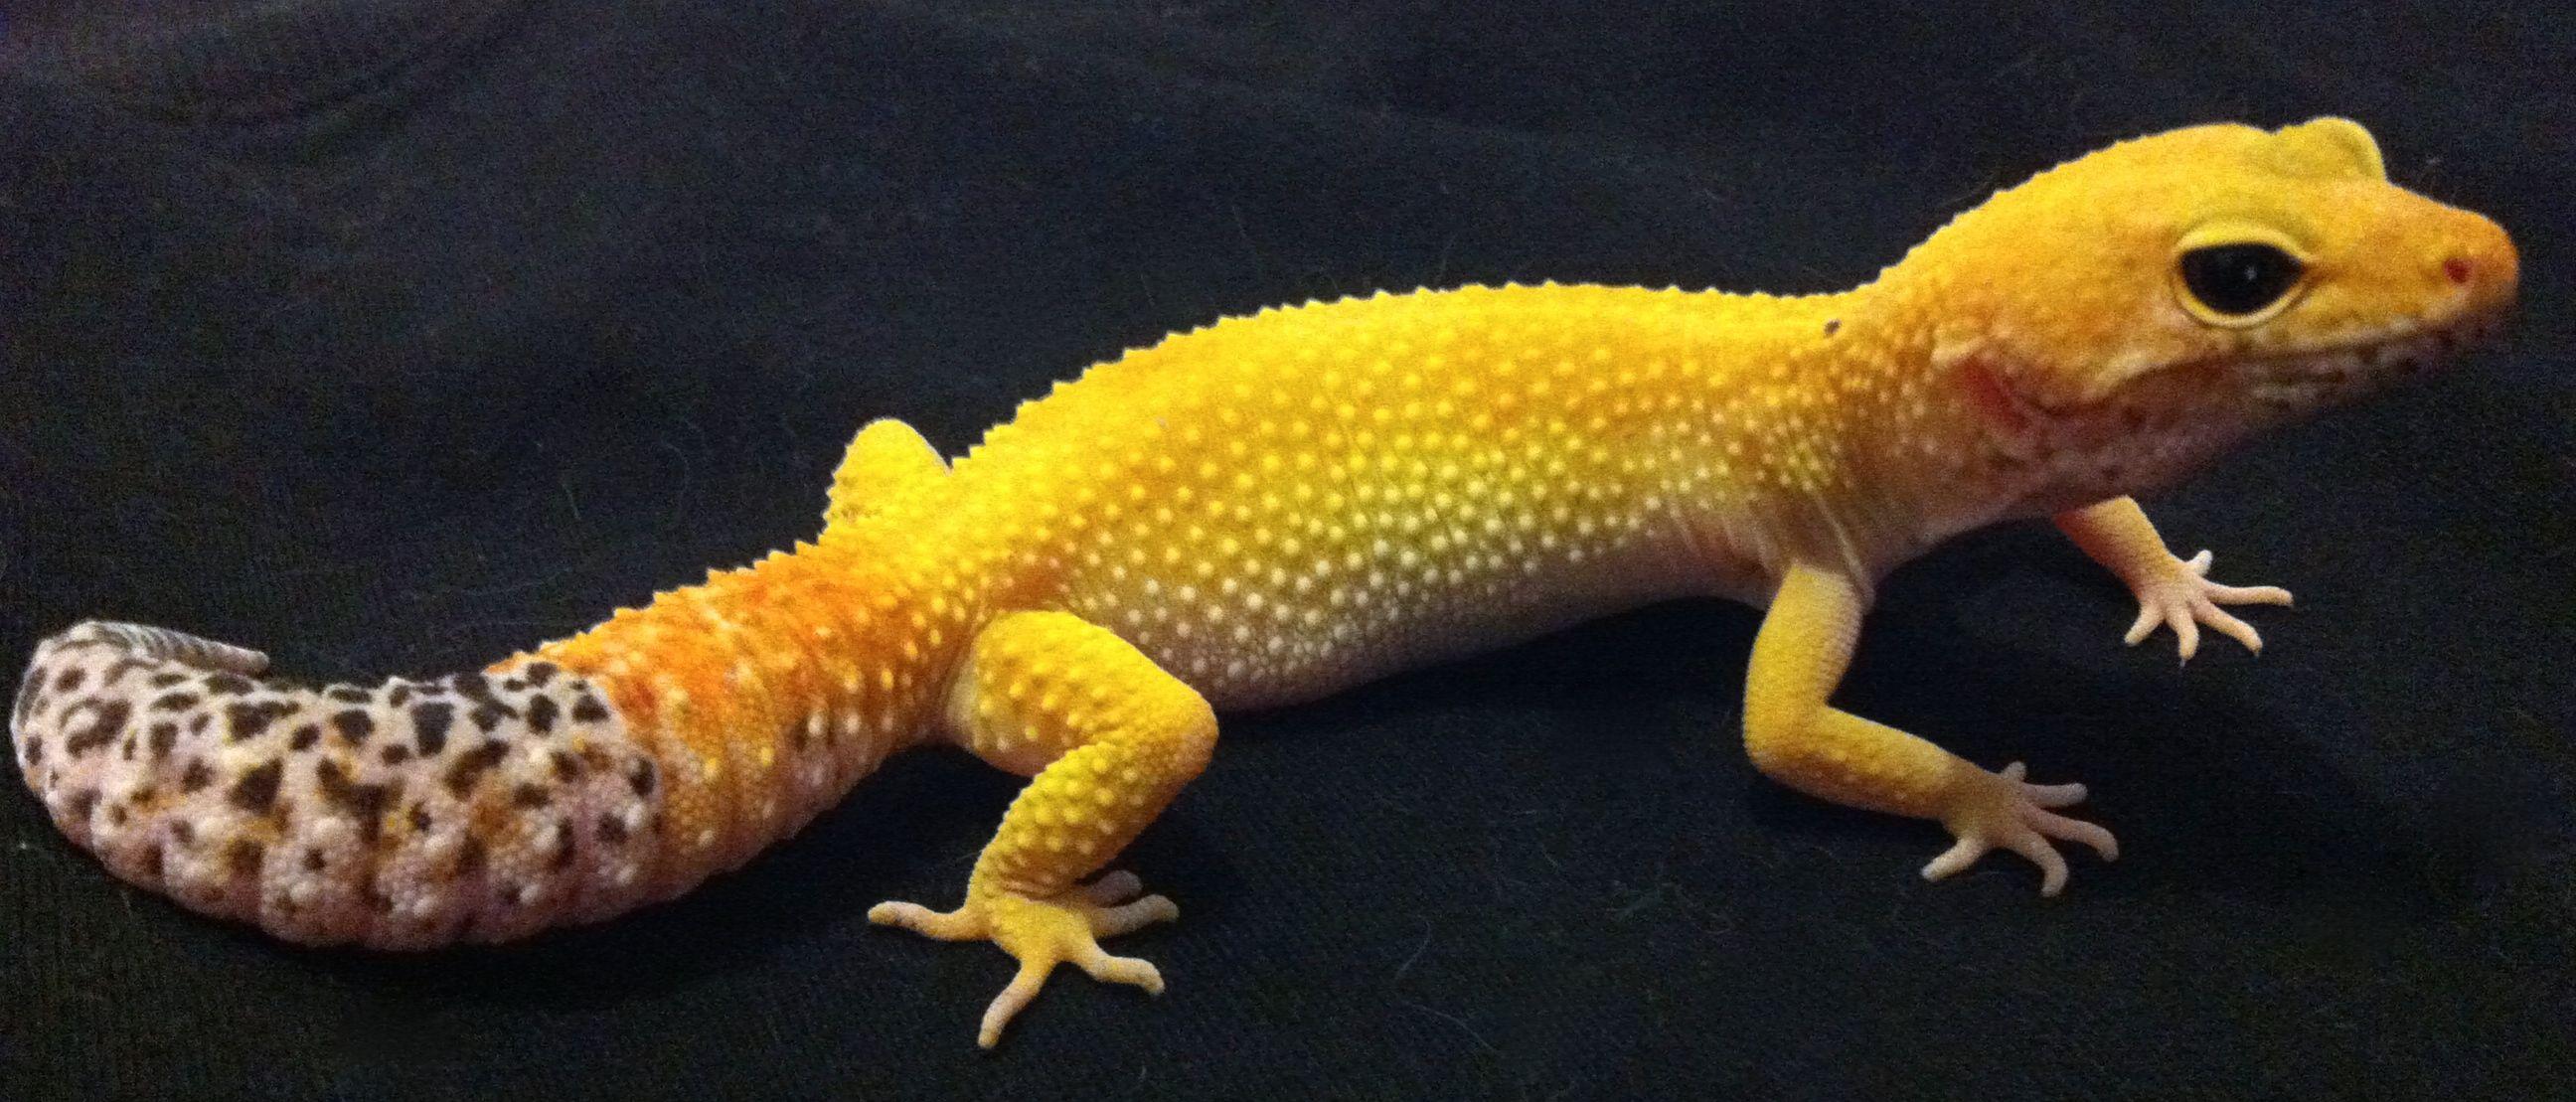 Pictures photos and description of leopard gecko morphs